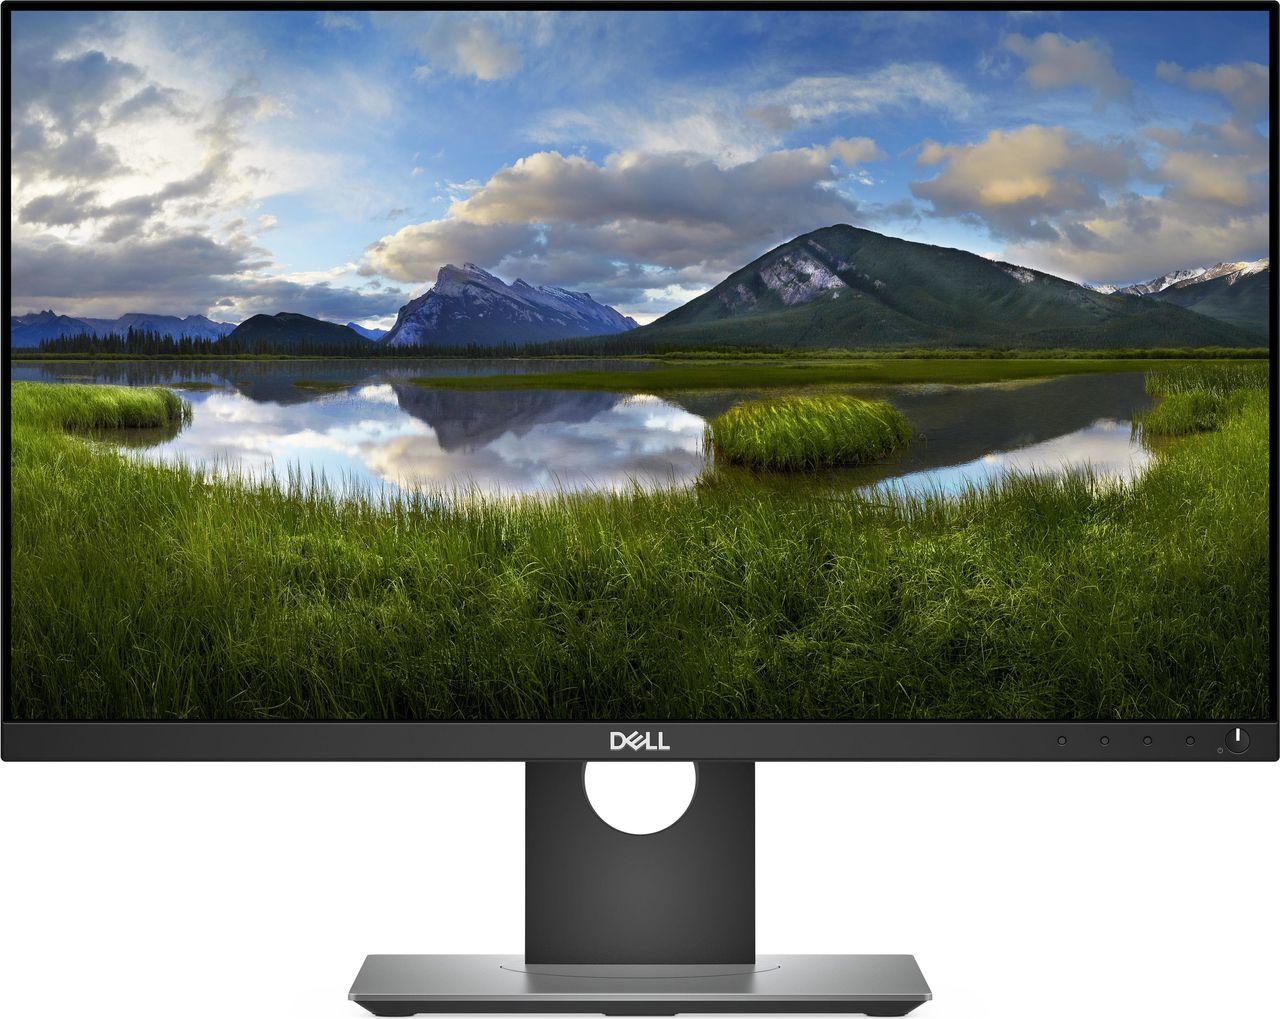 Dell P2418D - LED-Monitor - 61 cm (24) (23.8 sichtbar) - 2560 x 1440 - IPS - 300 cd/m² - 1000:1 - 5 ms - HDMI, VGA, DisplayPort